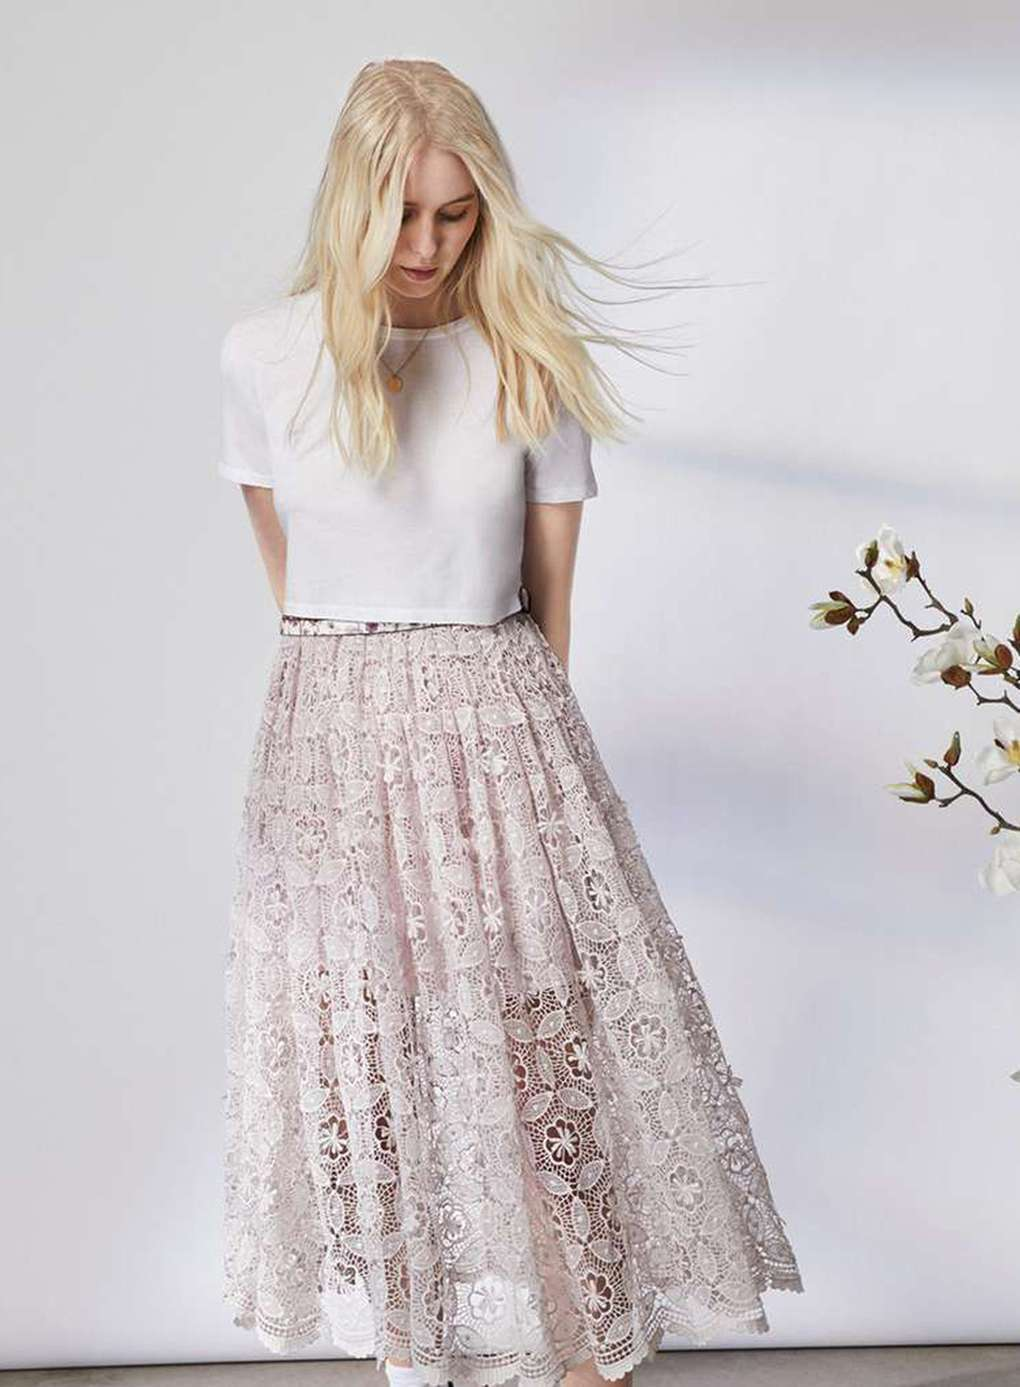 Premium Floral Lace Midi Skirt by Miss Selfridge SZ.10  New NWT MSRP  168